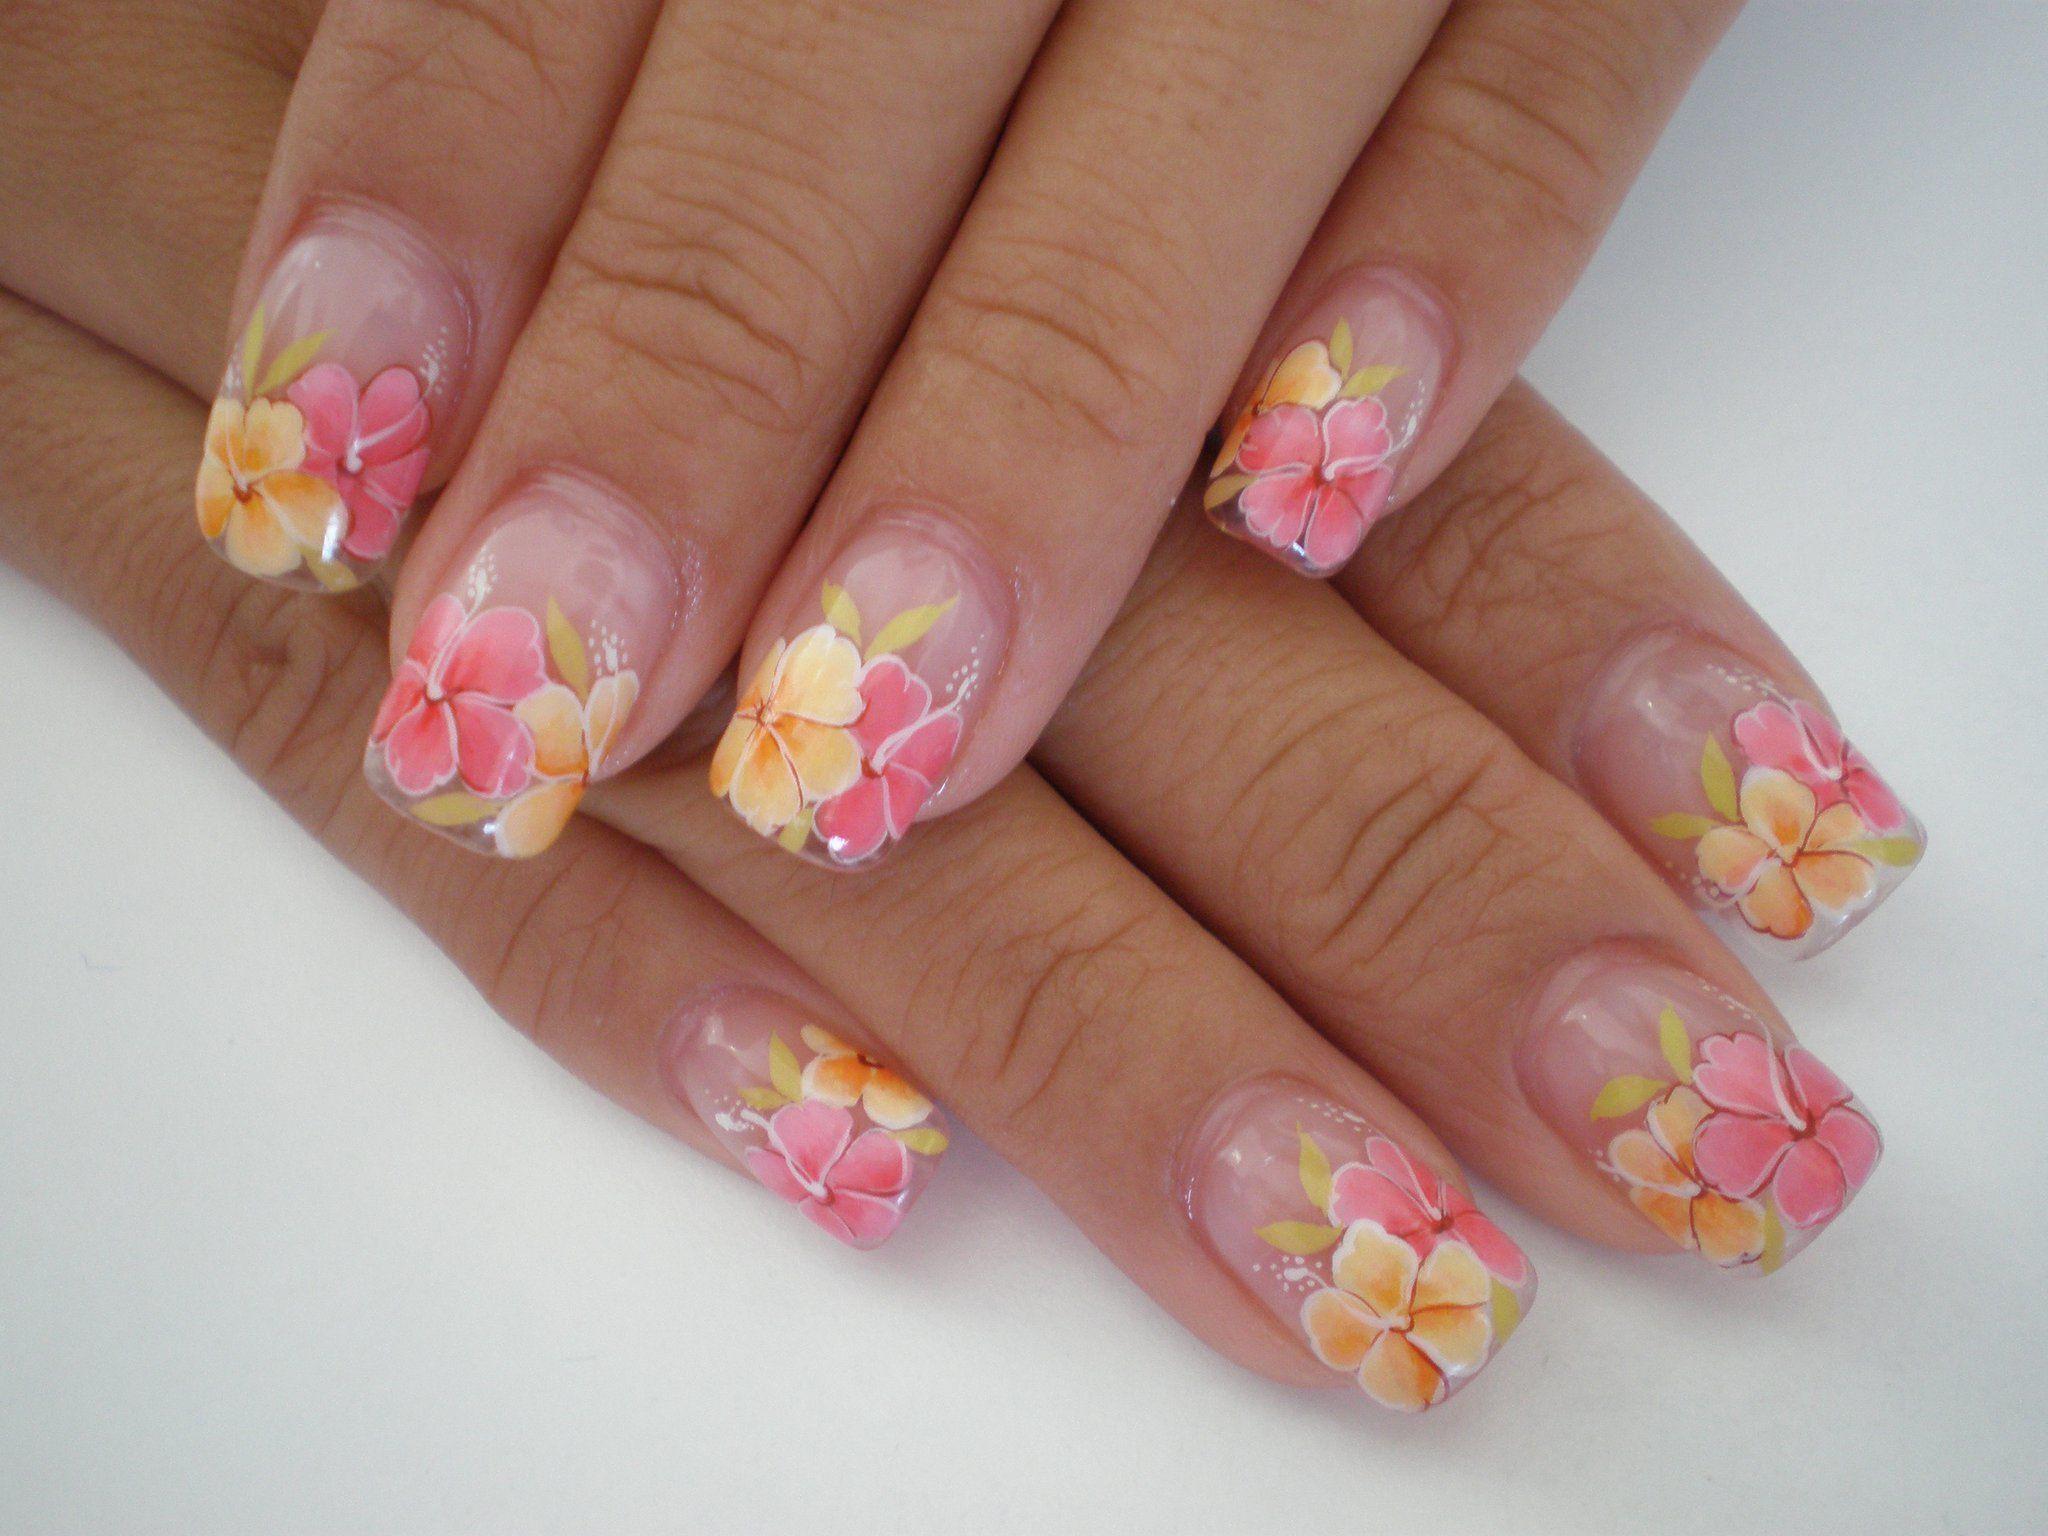 Hibiscus flower nails nails pinterest nails nail art and hibiscus flower nails hawaiian flowers hibiscus flowers one stroke nails fingernail designs izmirmasajfo